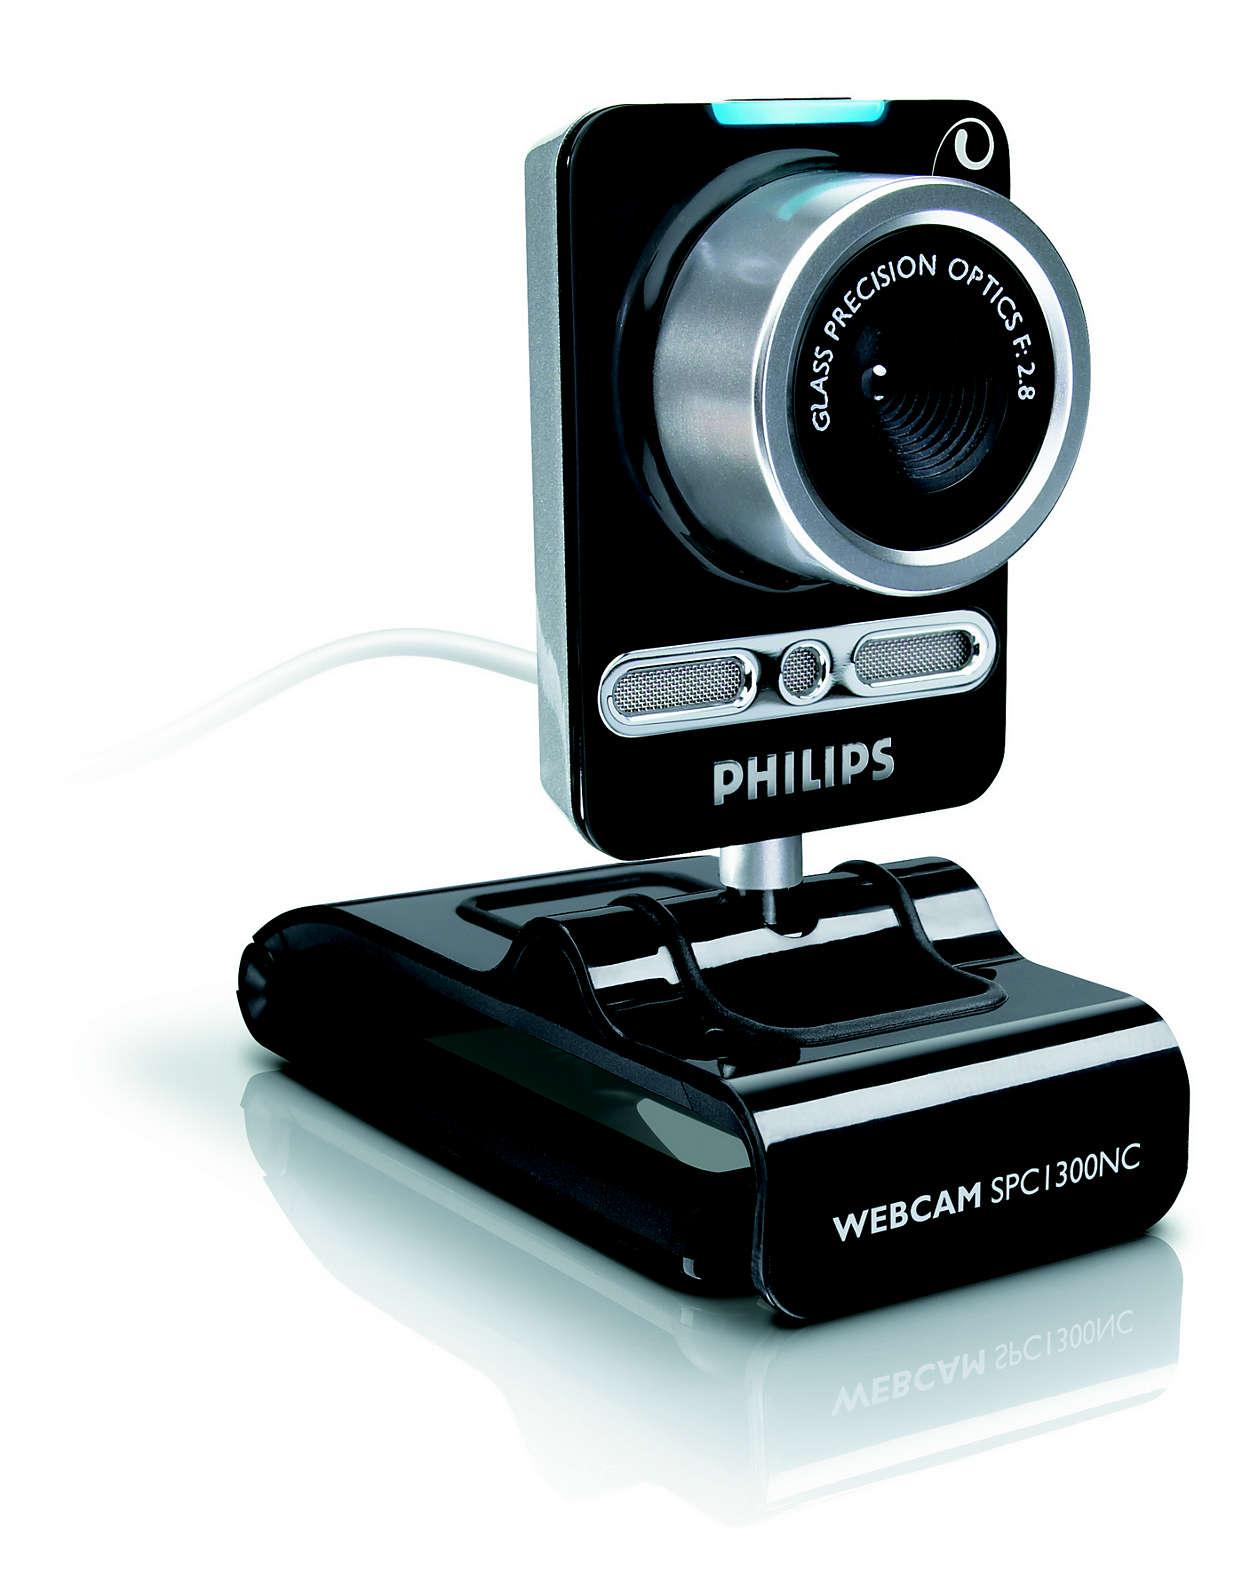 HD-video og krystalklar lyd